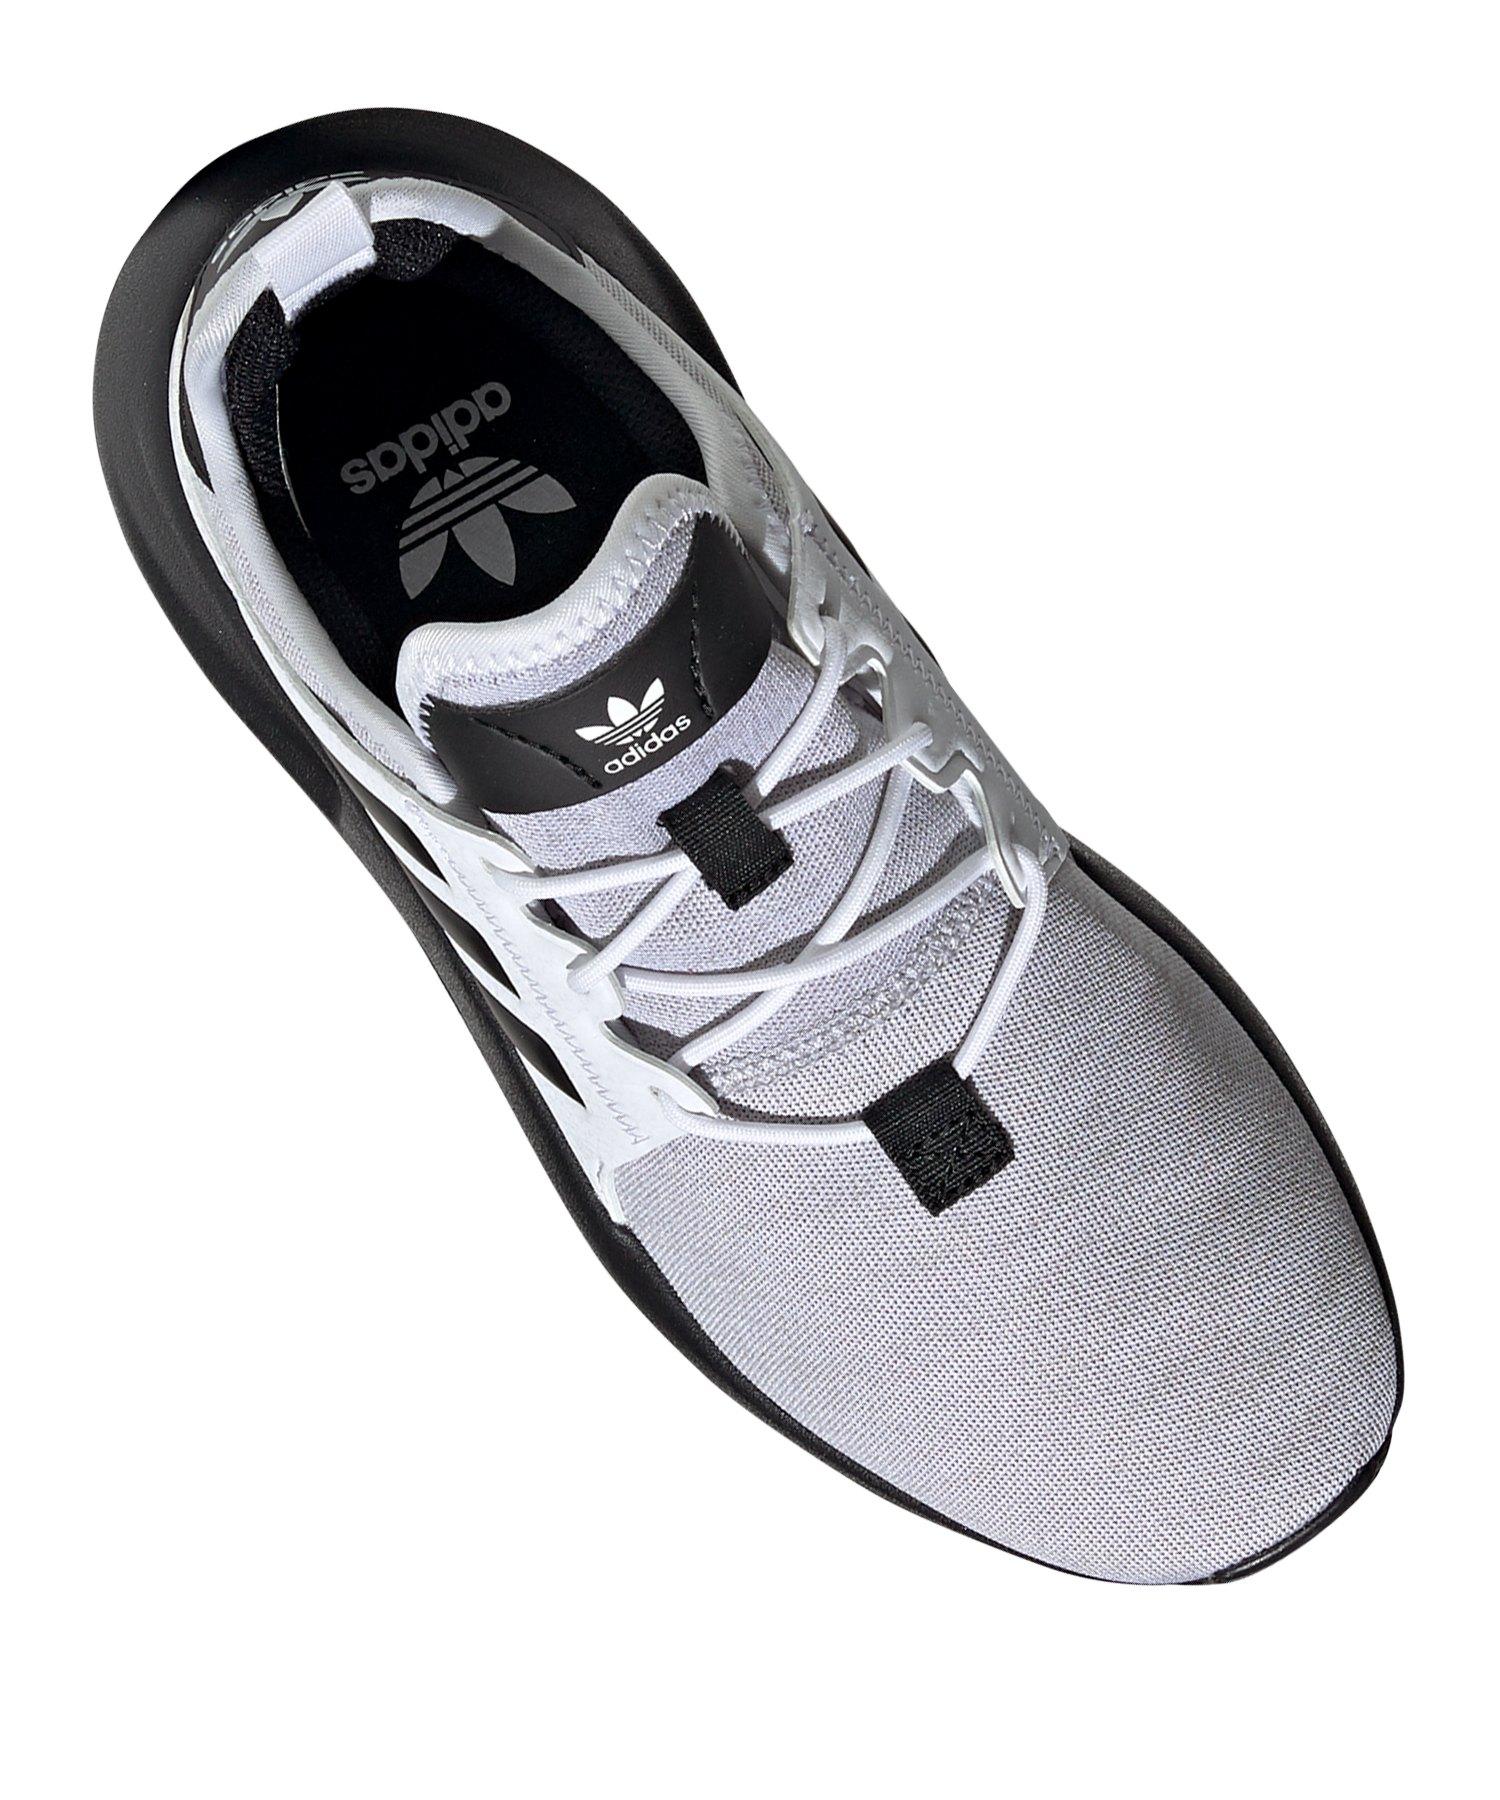 Grau Freizeit X Weiss Originals Adidas Kids Sneaker plr lifestyle x1qOgXX8w